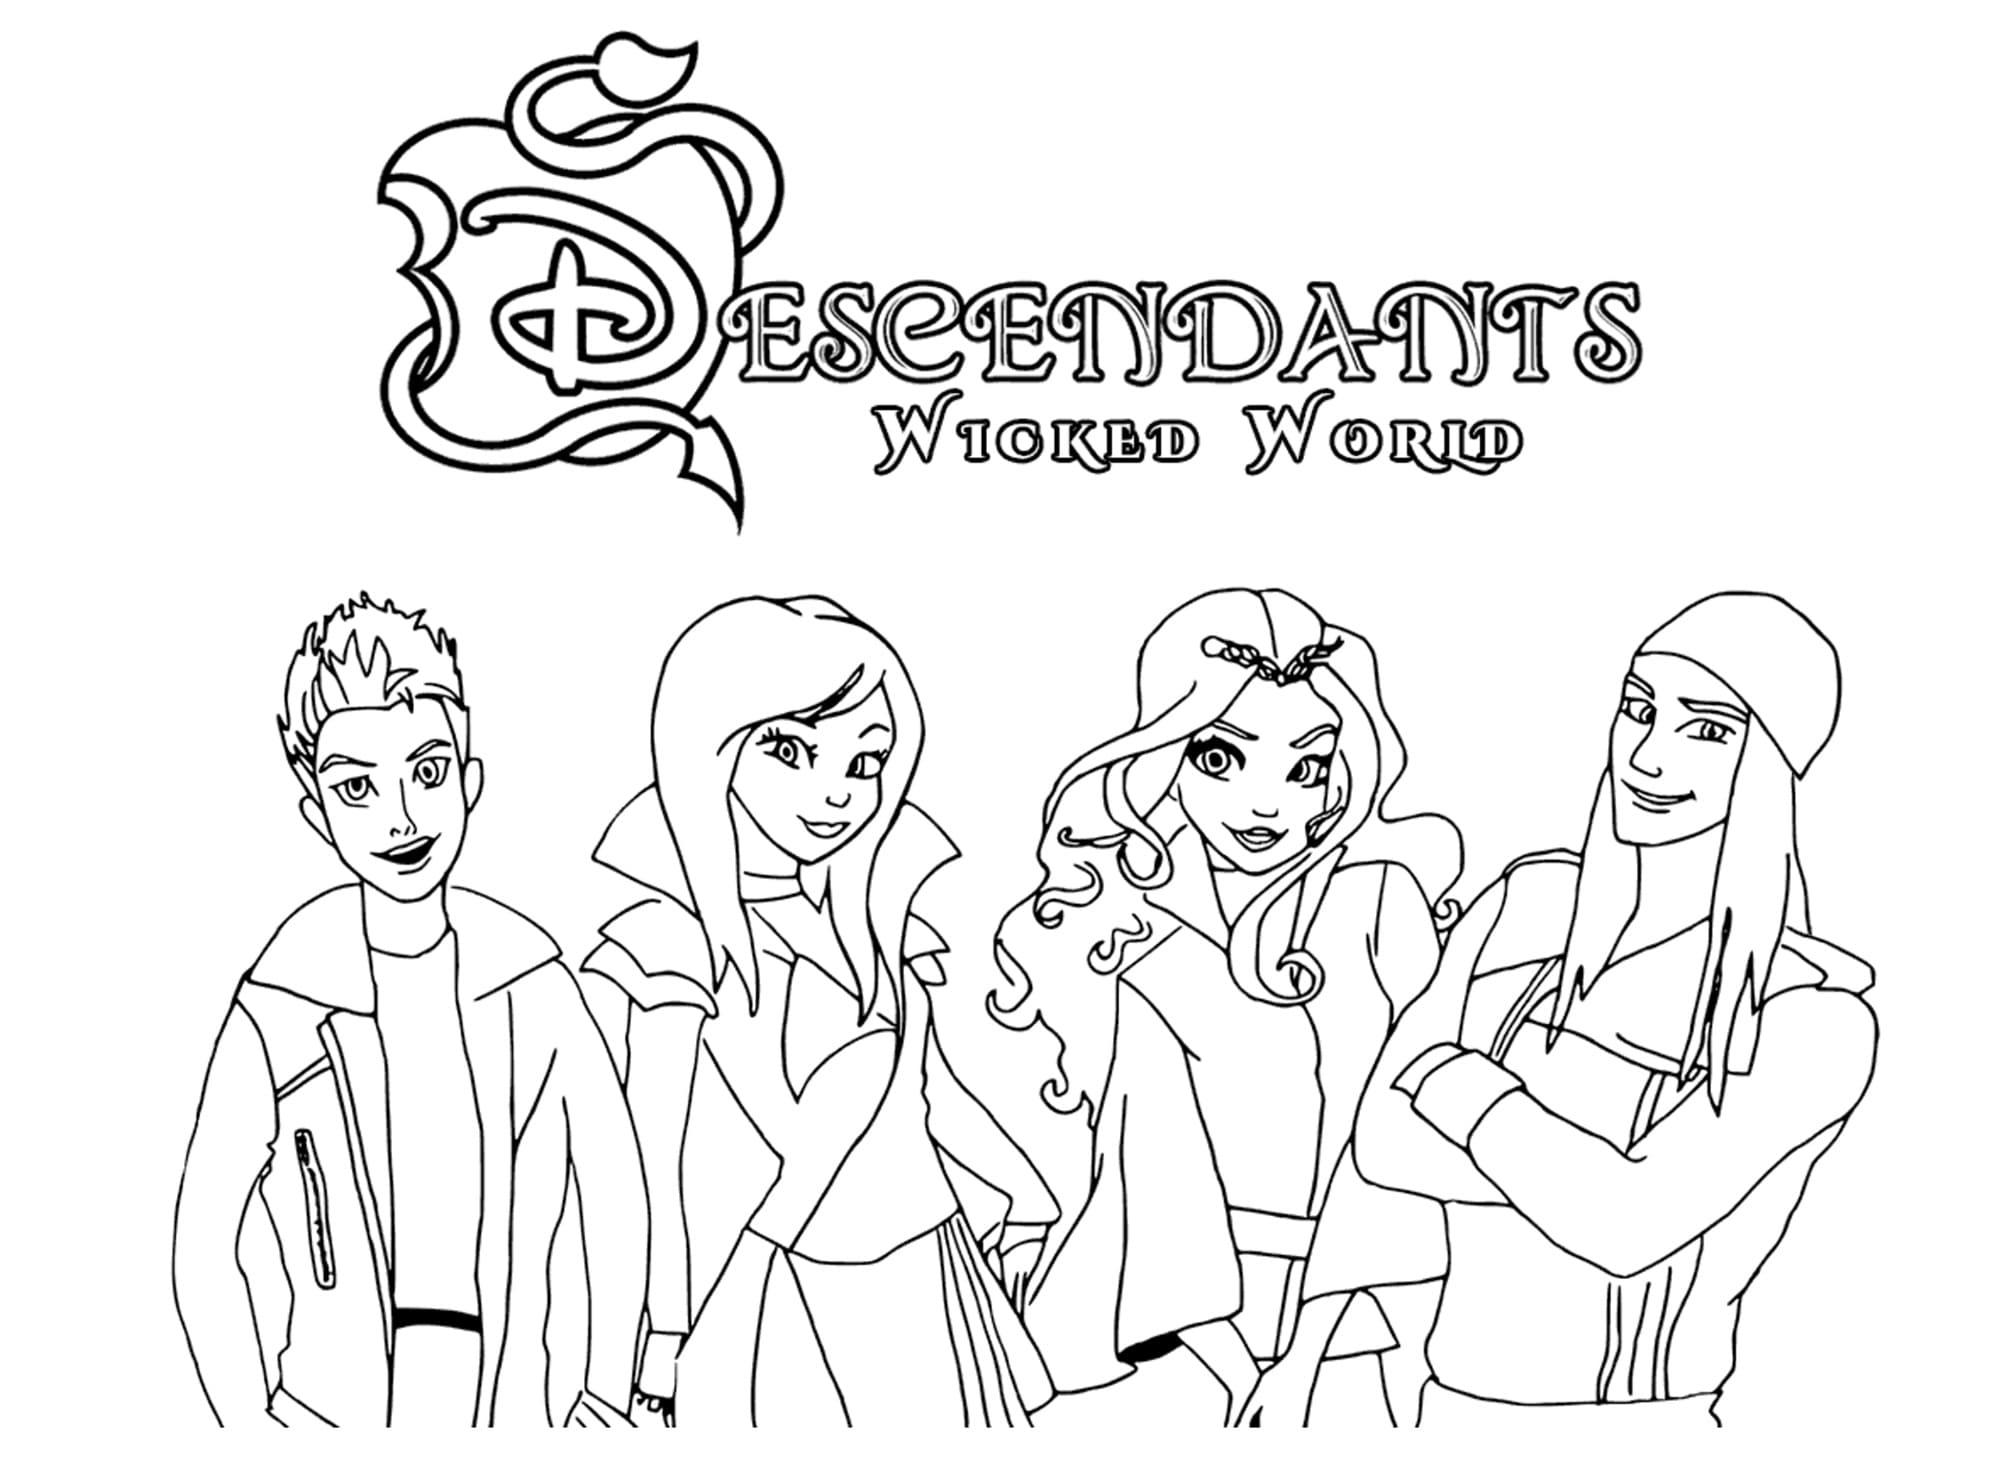 Ausmalbilder Erben (Descendants). Kostenlos Drucken Disney mit Ausmalbilder Zum Drucken Disney